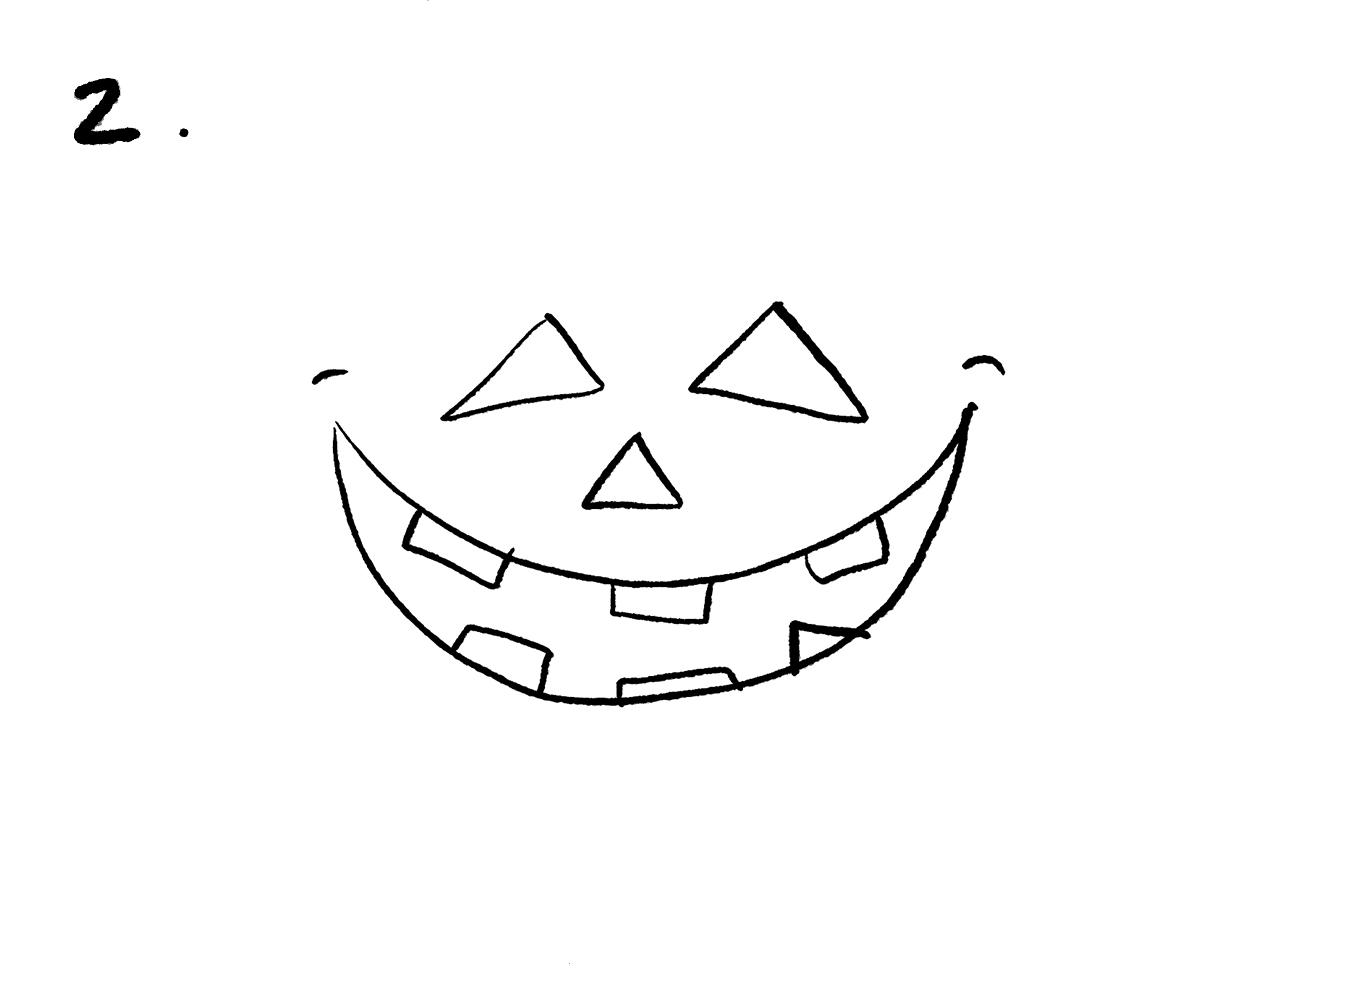 Rita en halloweenpumpa – steg 2 49066dae3b704